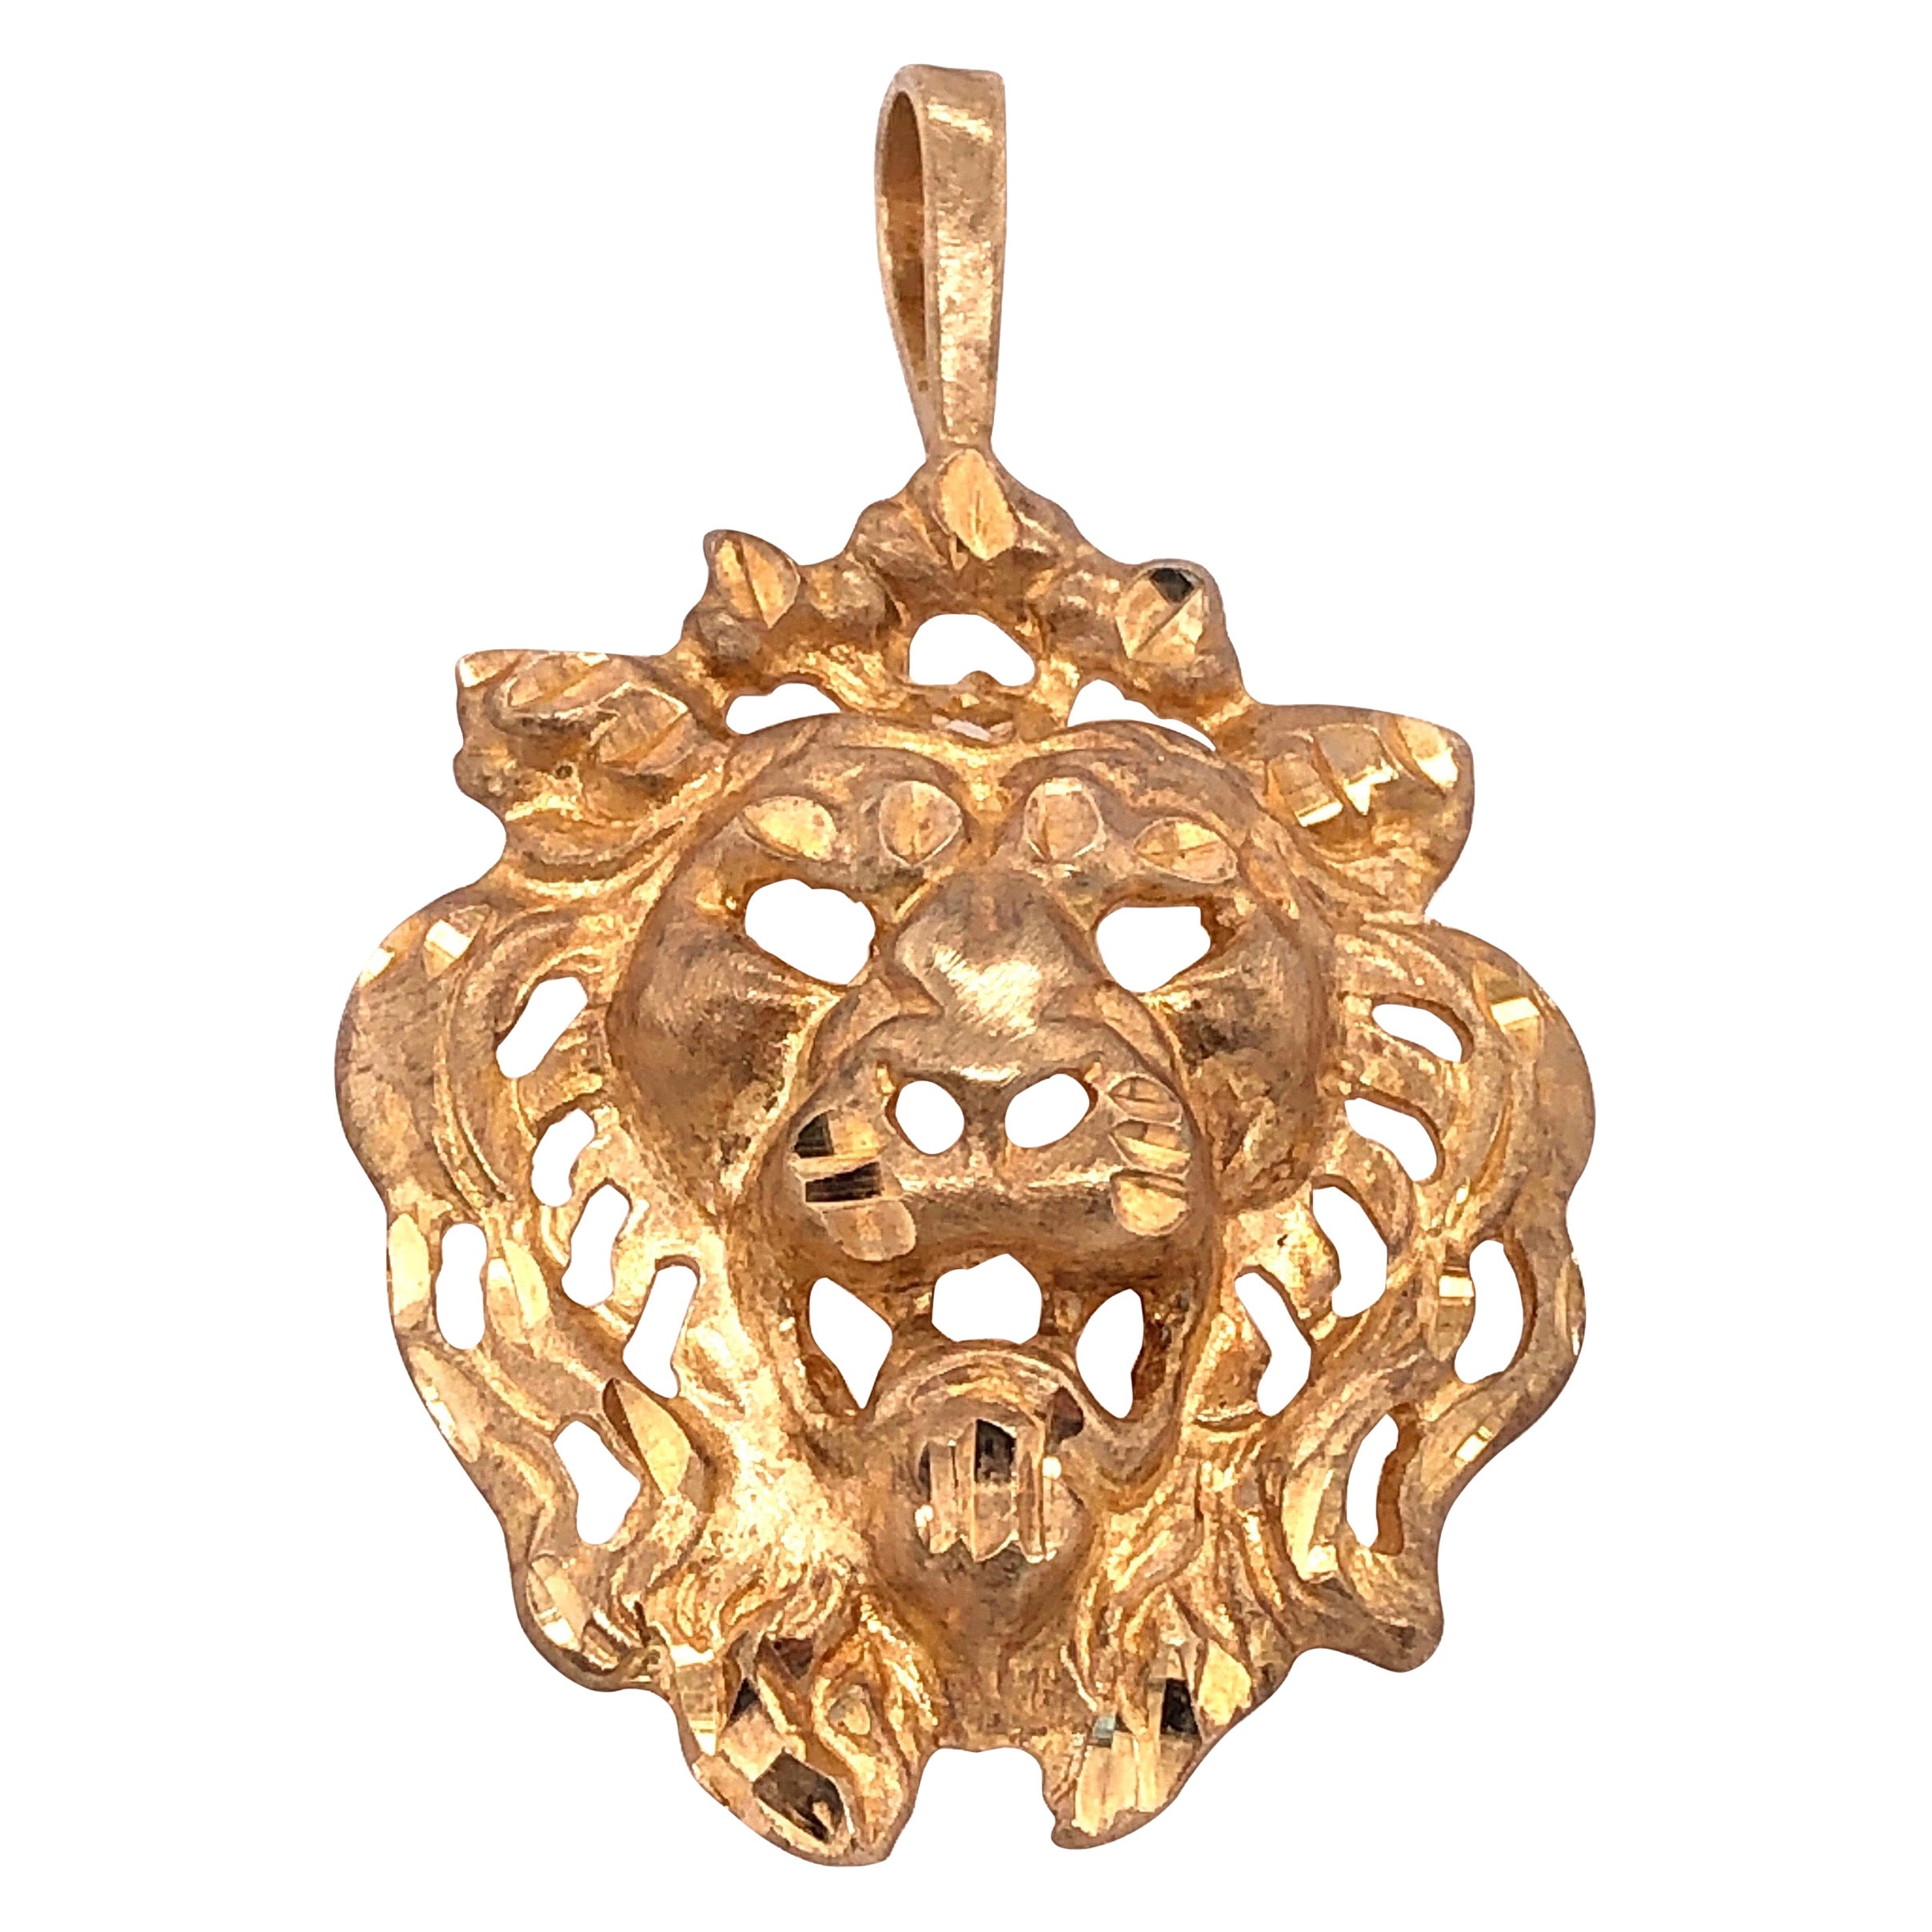 14 Karat Yellow Gold Lion Head Pendant or Charm